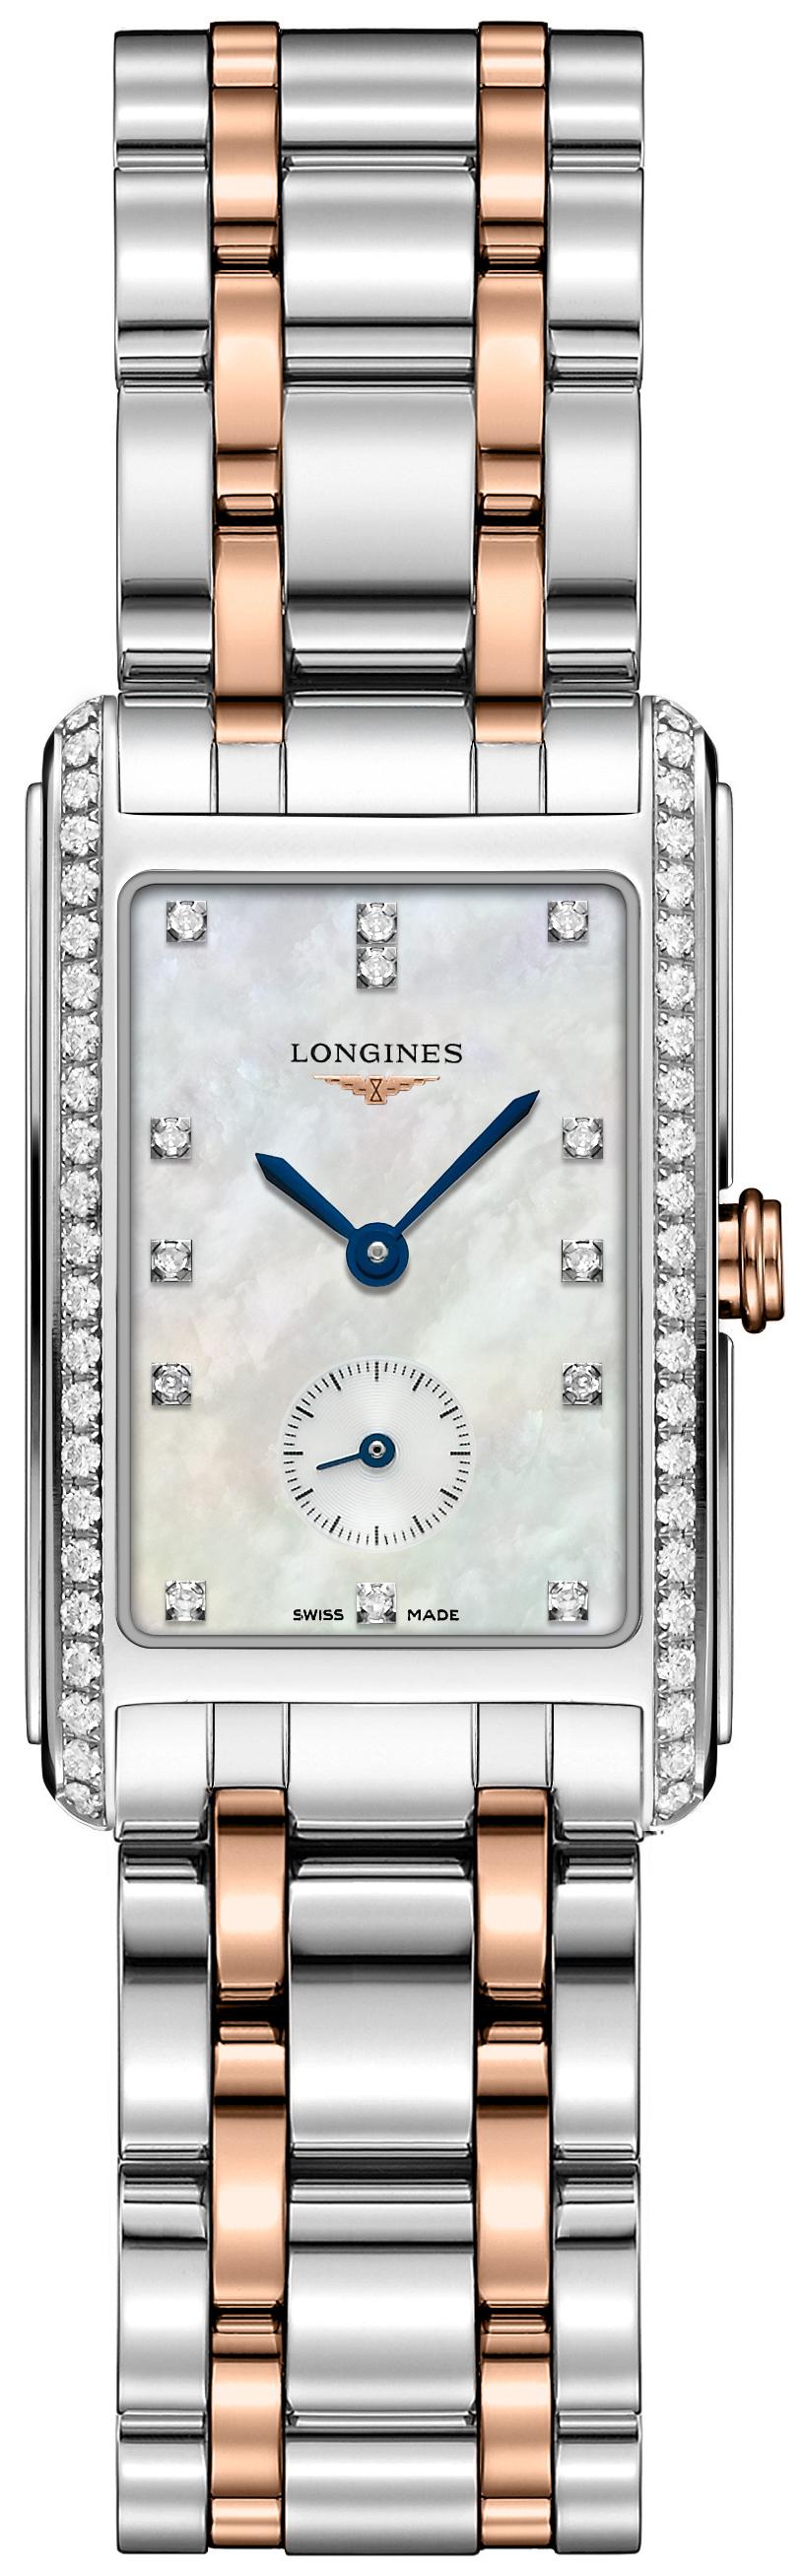 Longines Dolcevita Dameklokke L5.512.5.89.7 Hvit/18 karat rosé gull - Longines